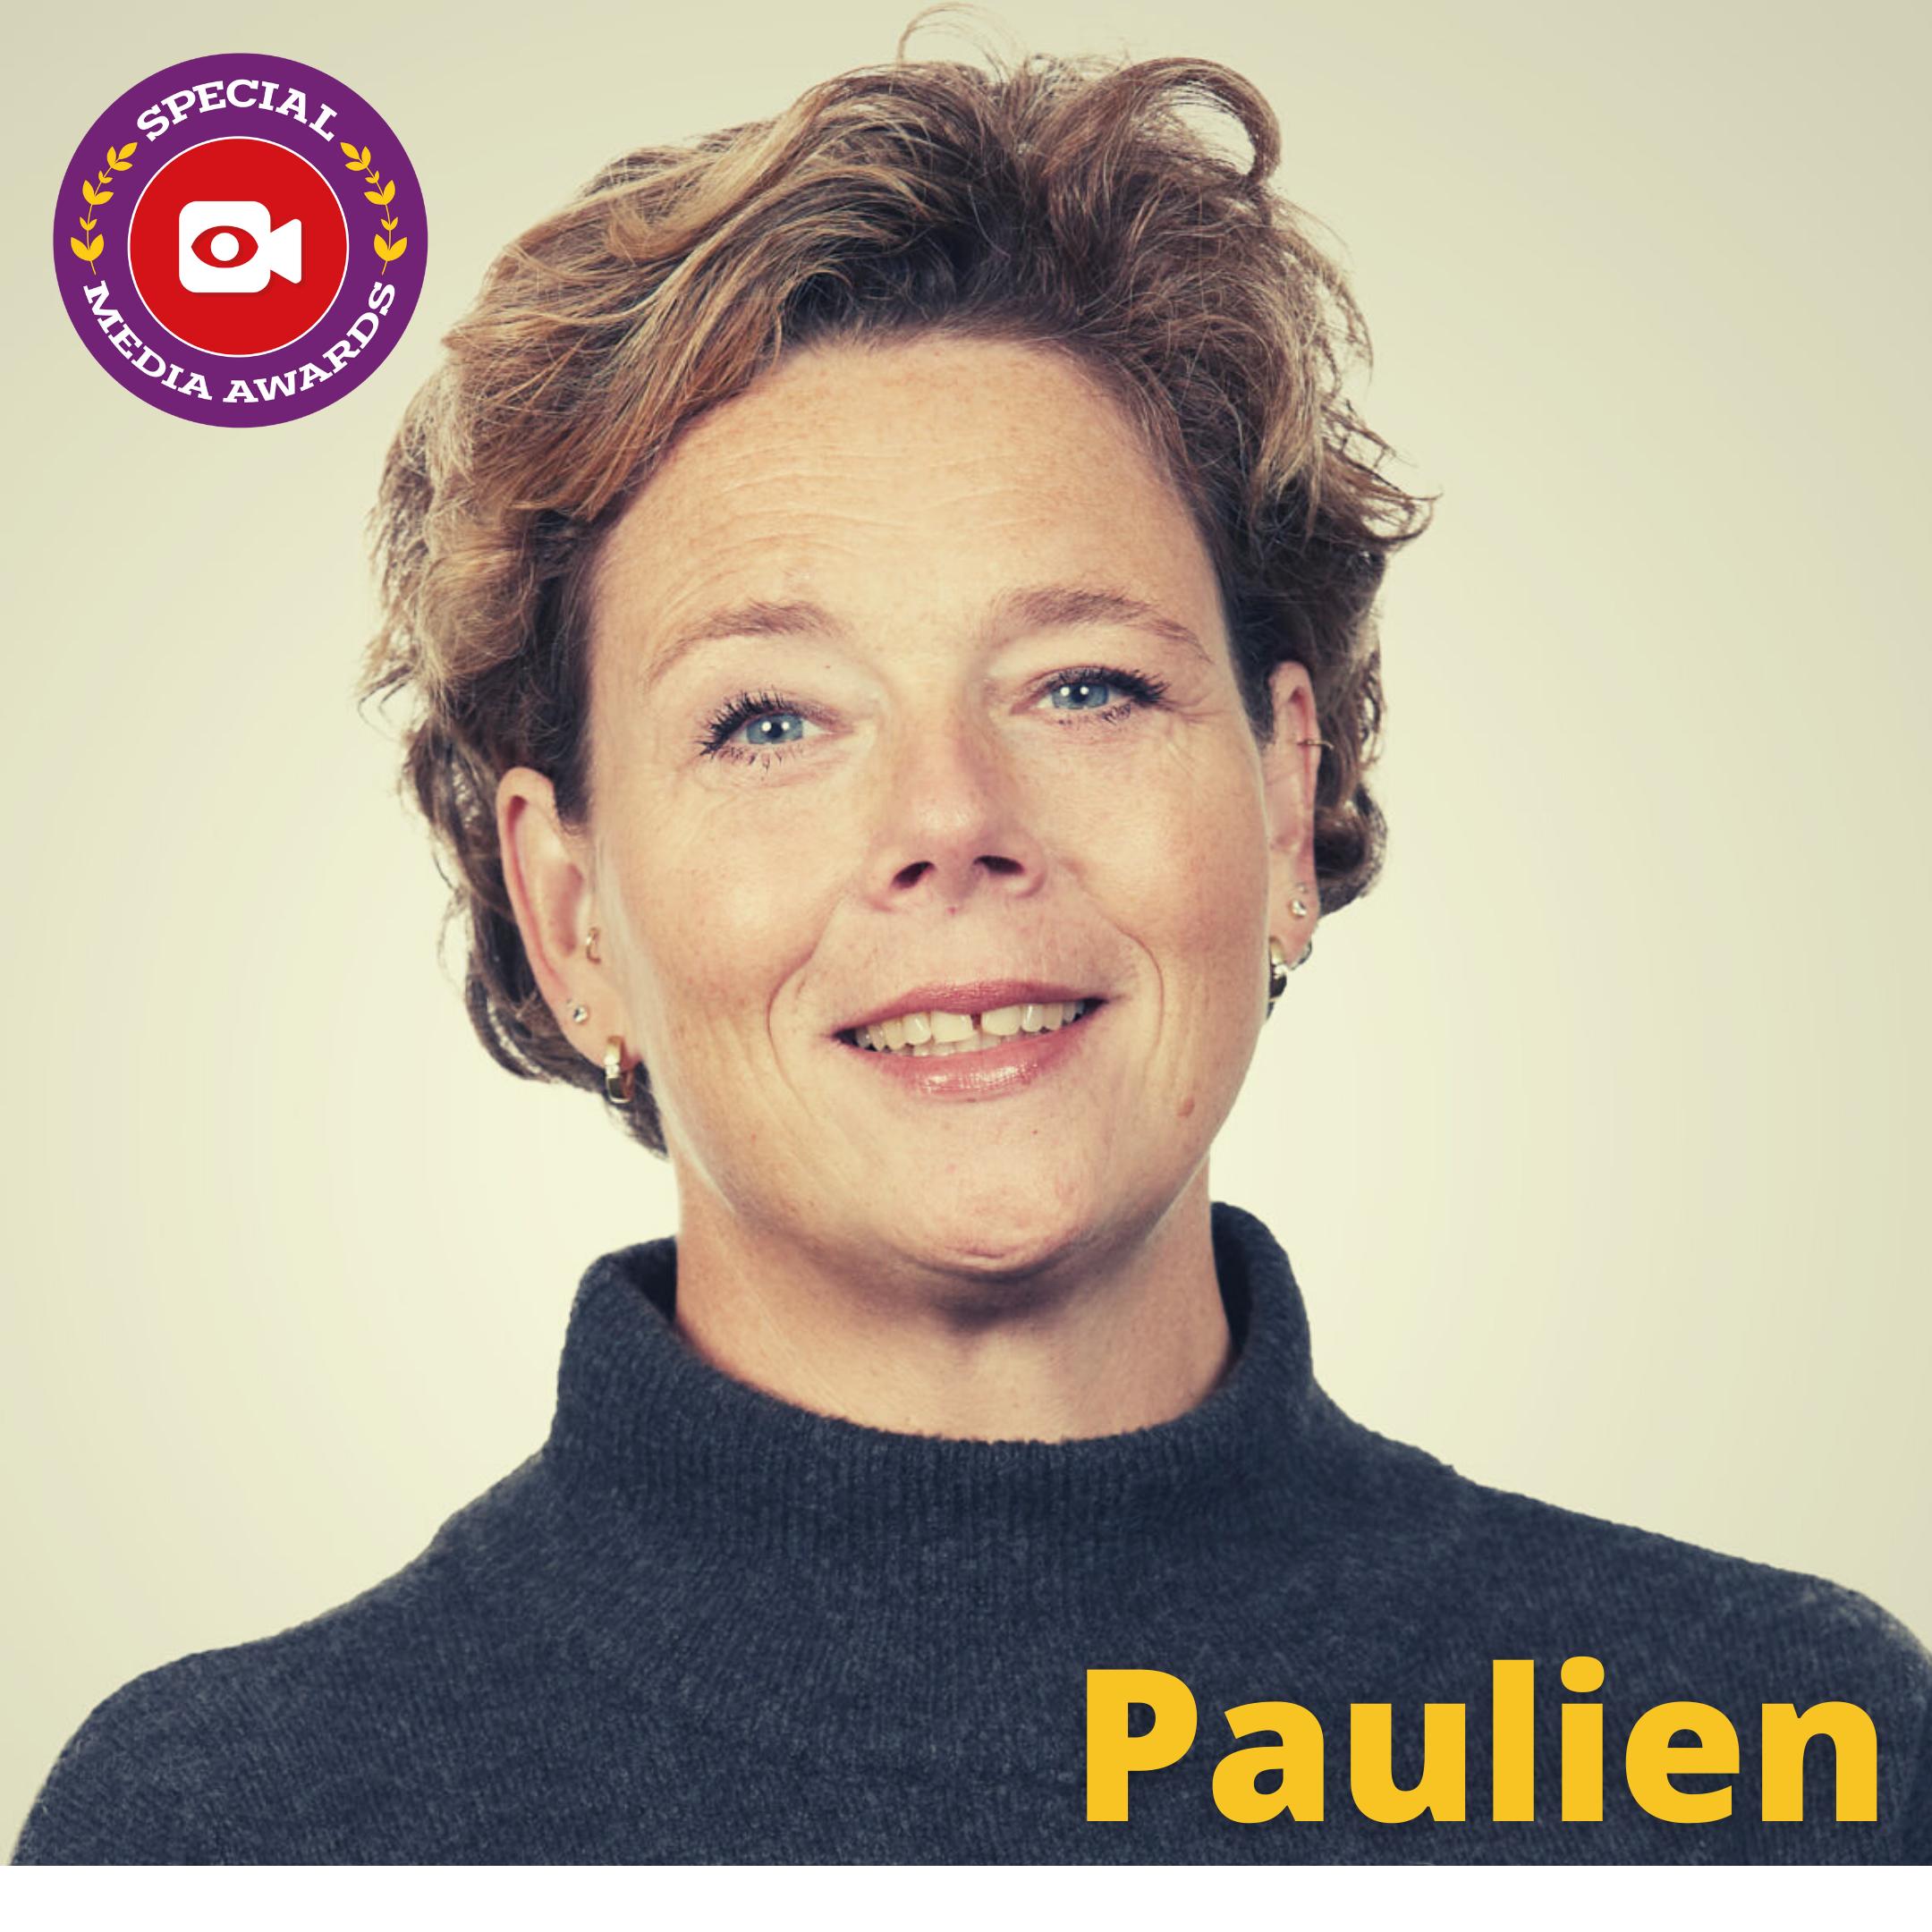 Paulien Knaup